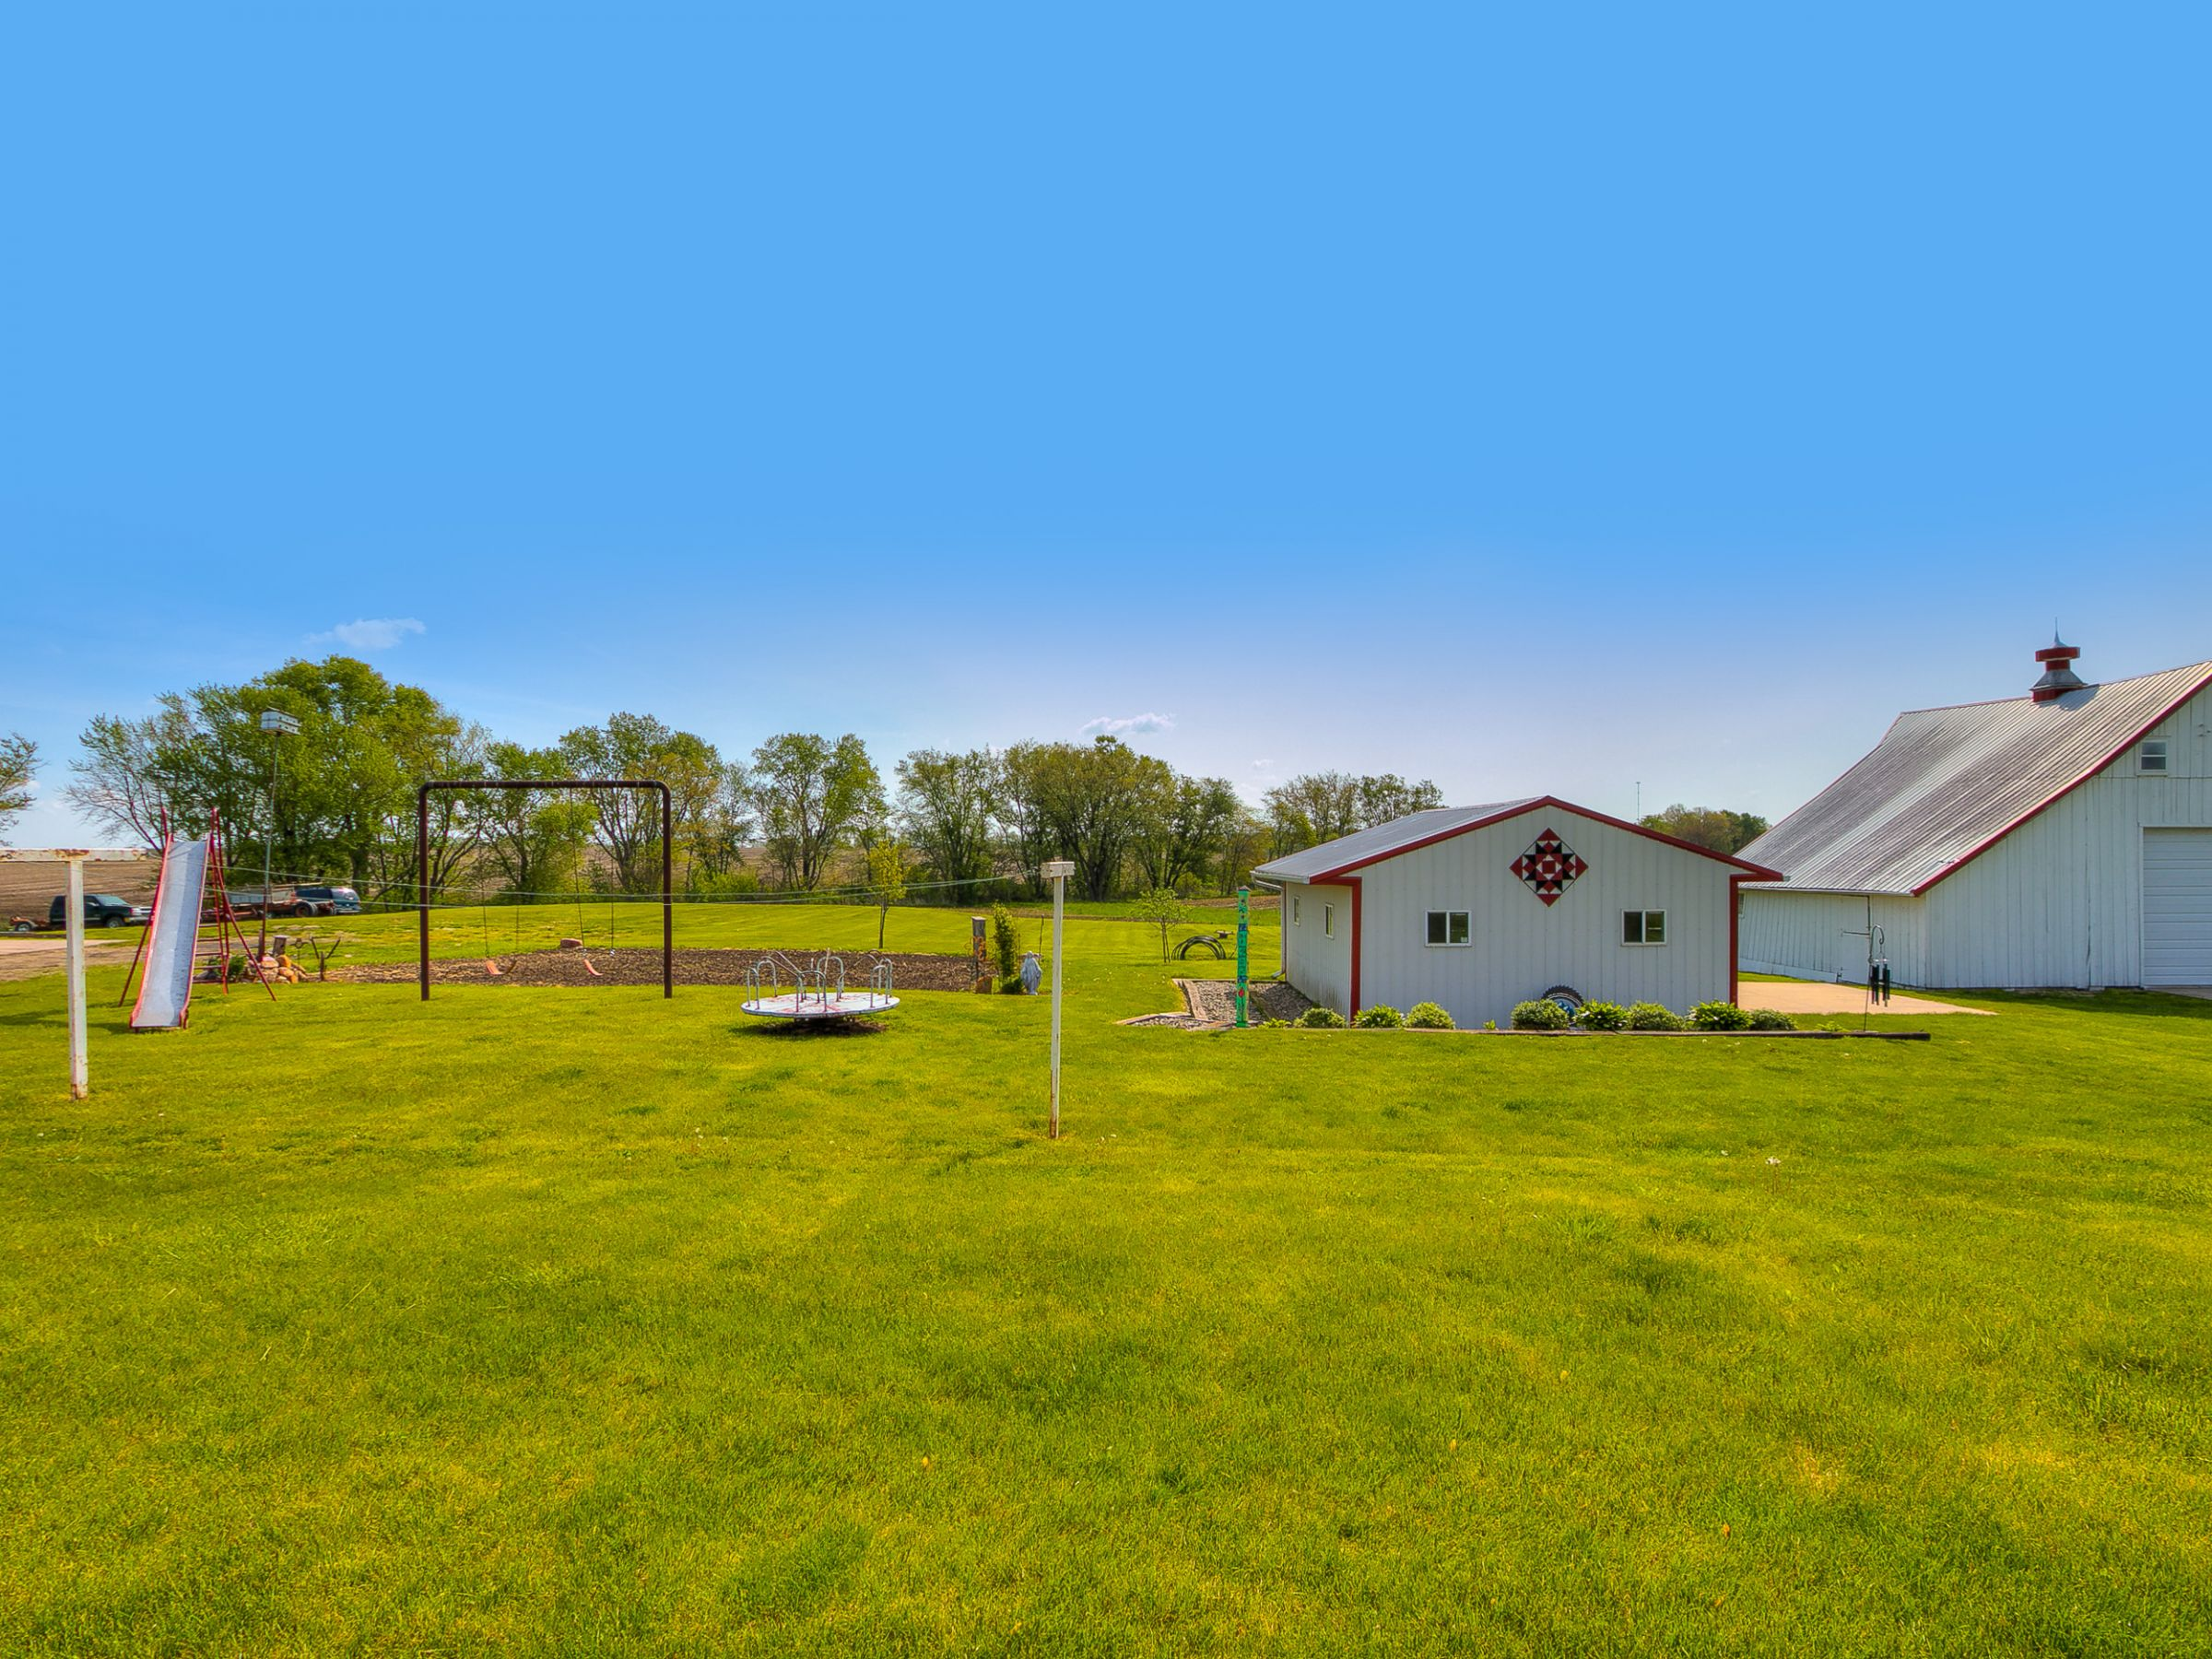 residential-warren-county-iowa-3-acres-listing-number-15516-4-2021-05-12-144749.jpg